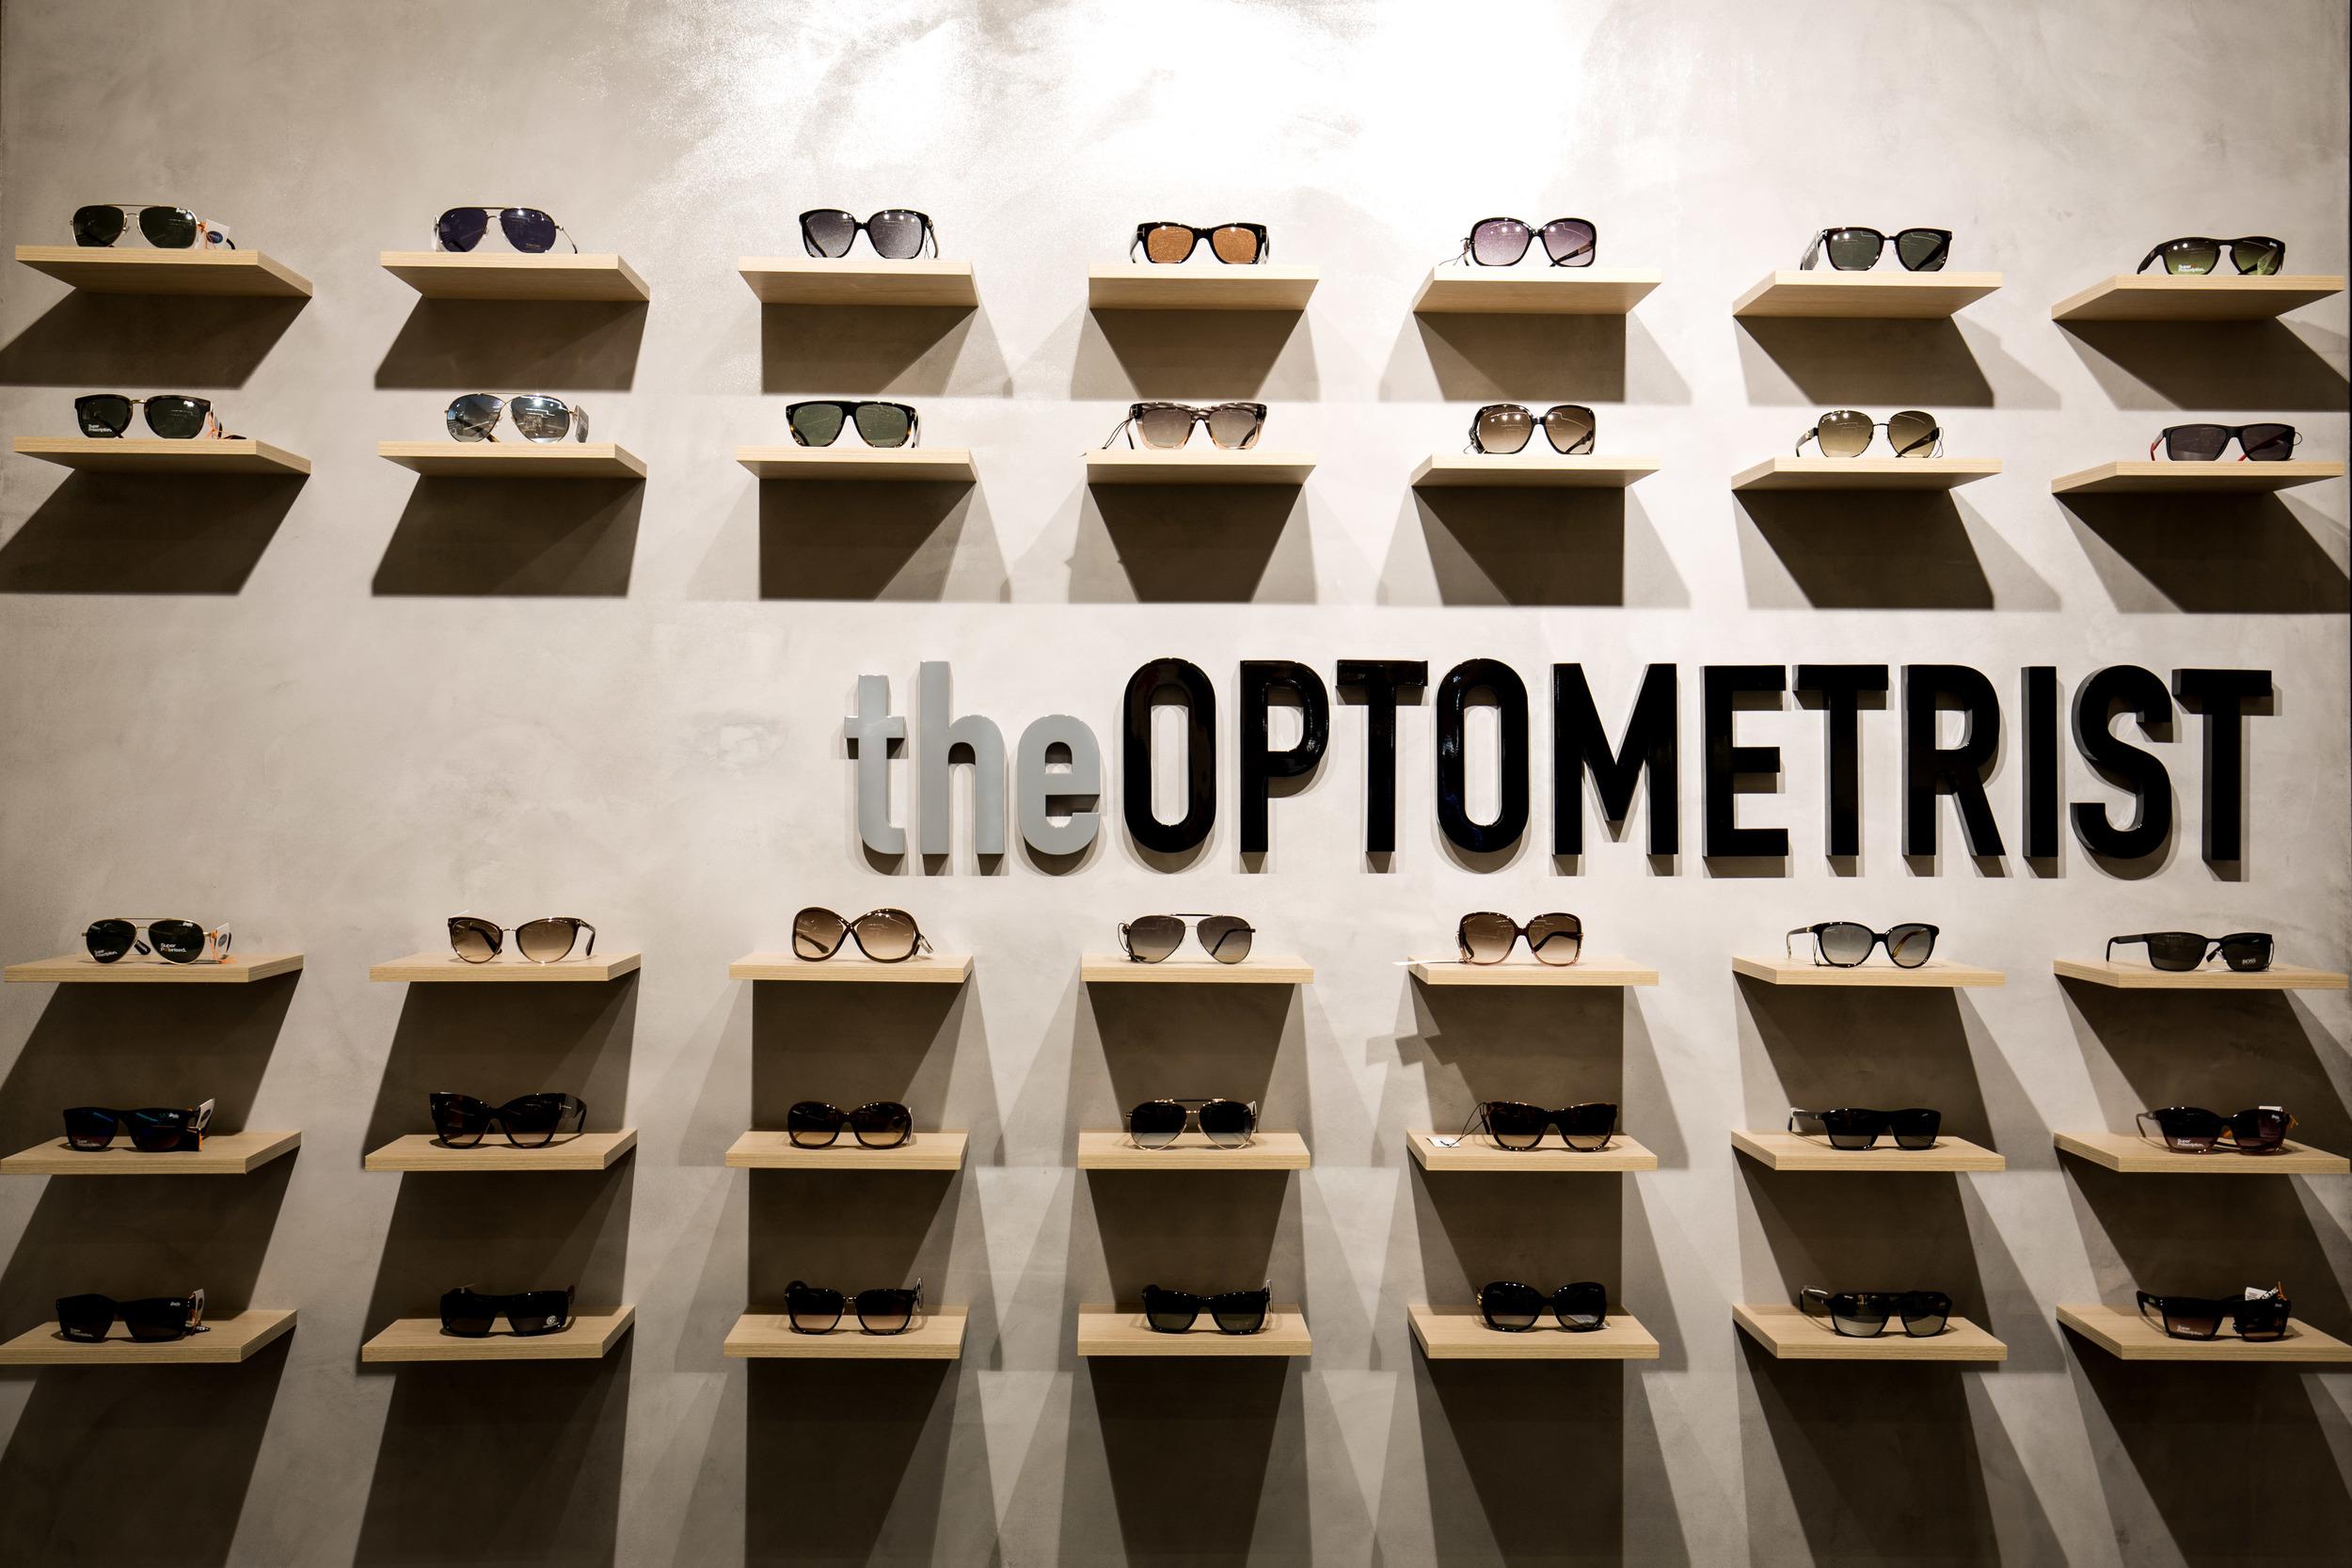 theOPTOMETRIST-7.jpg